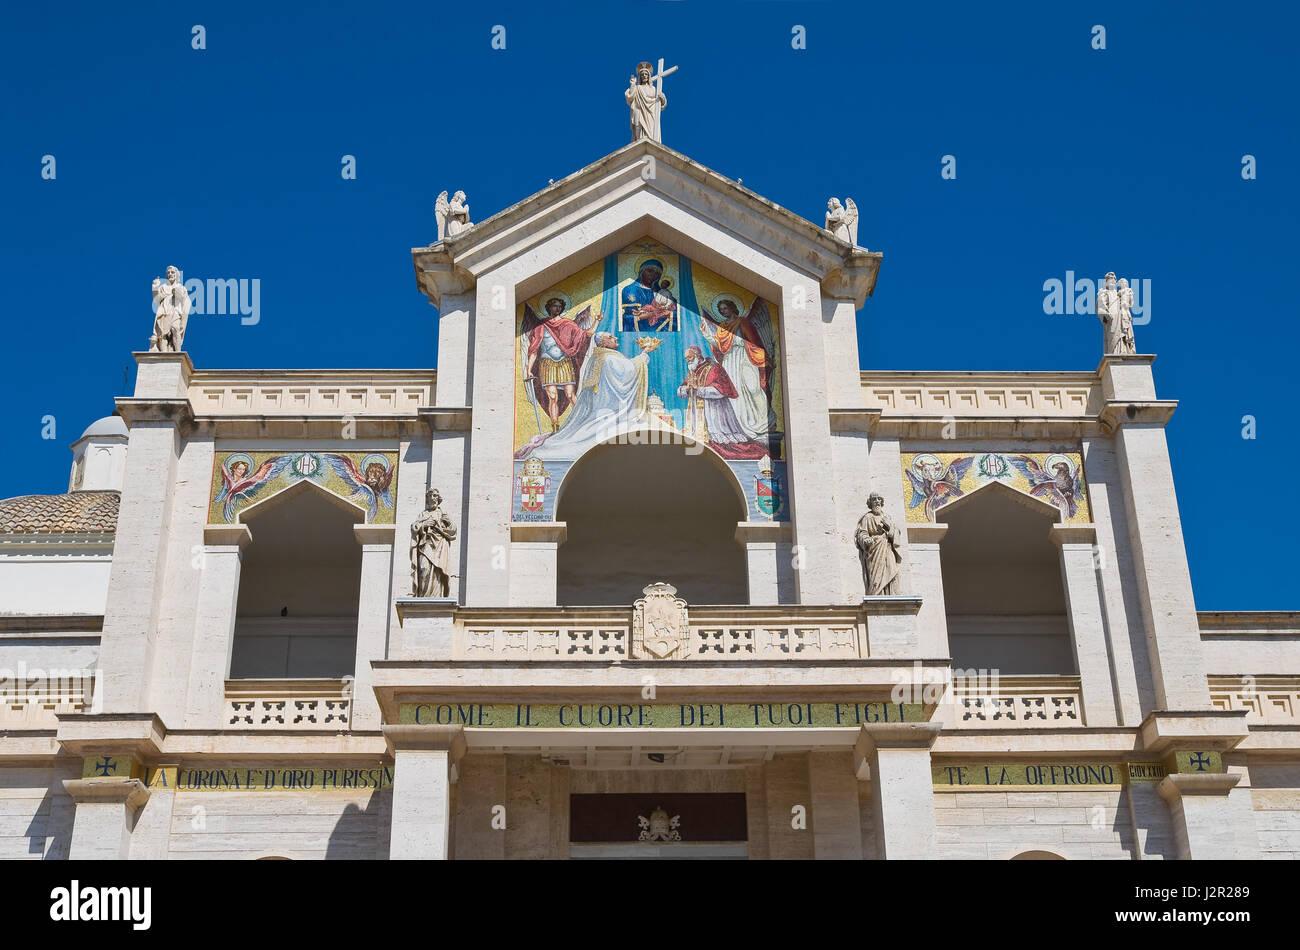 Manfredonia photos manfredonia images alamy - Port des pouilles ...